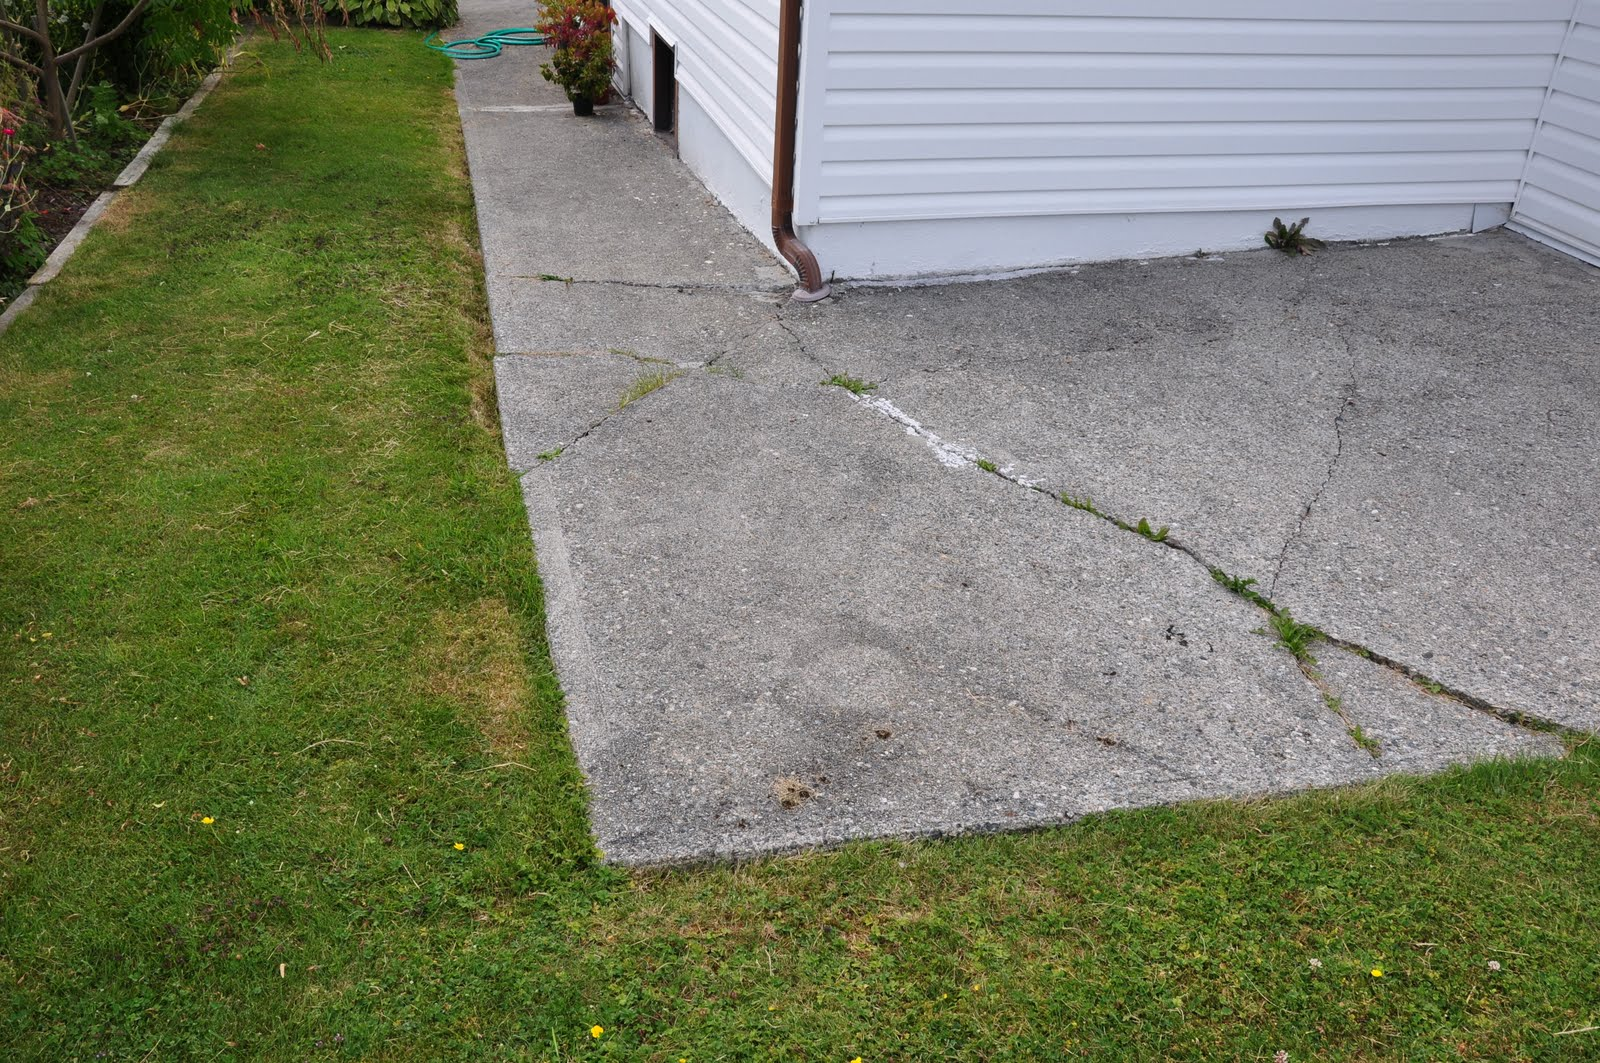 Thistle garden around the house for Drainage around house